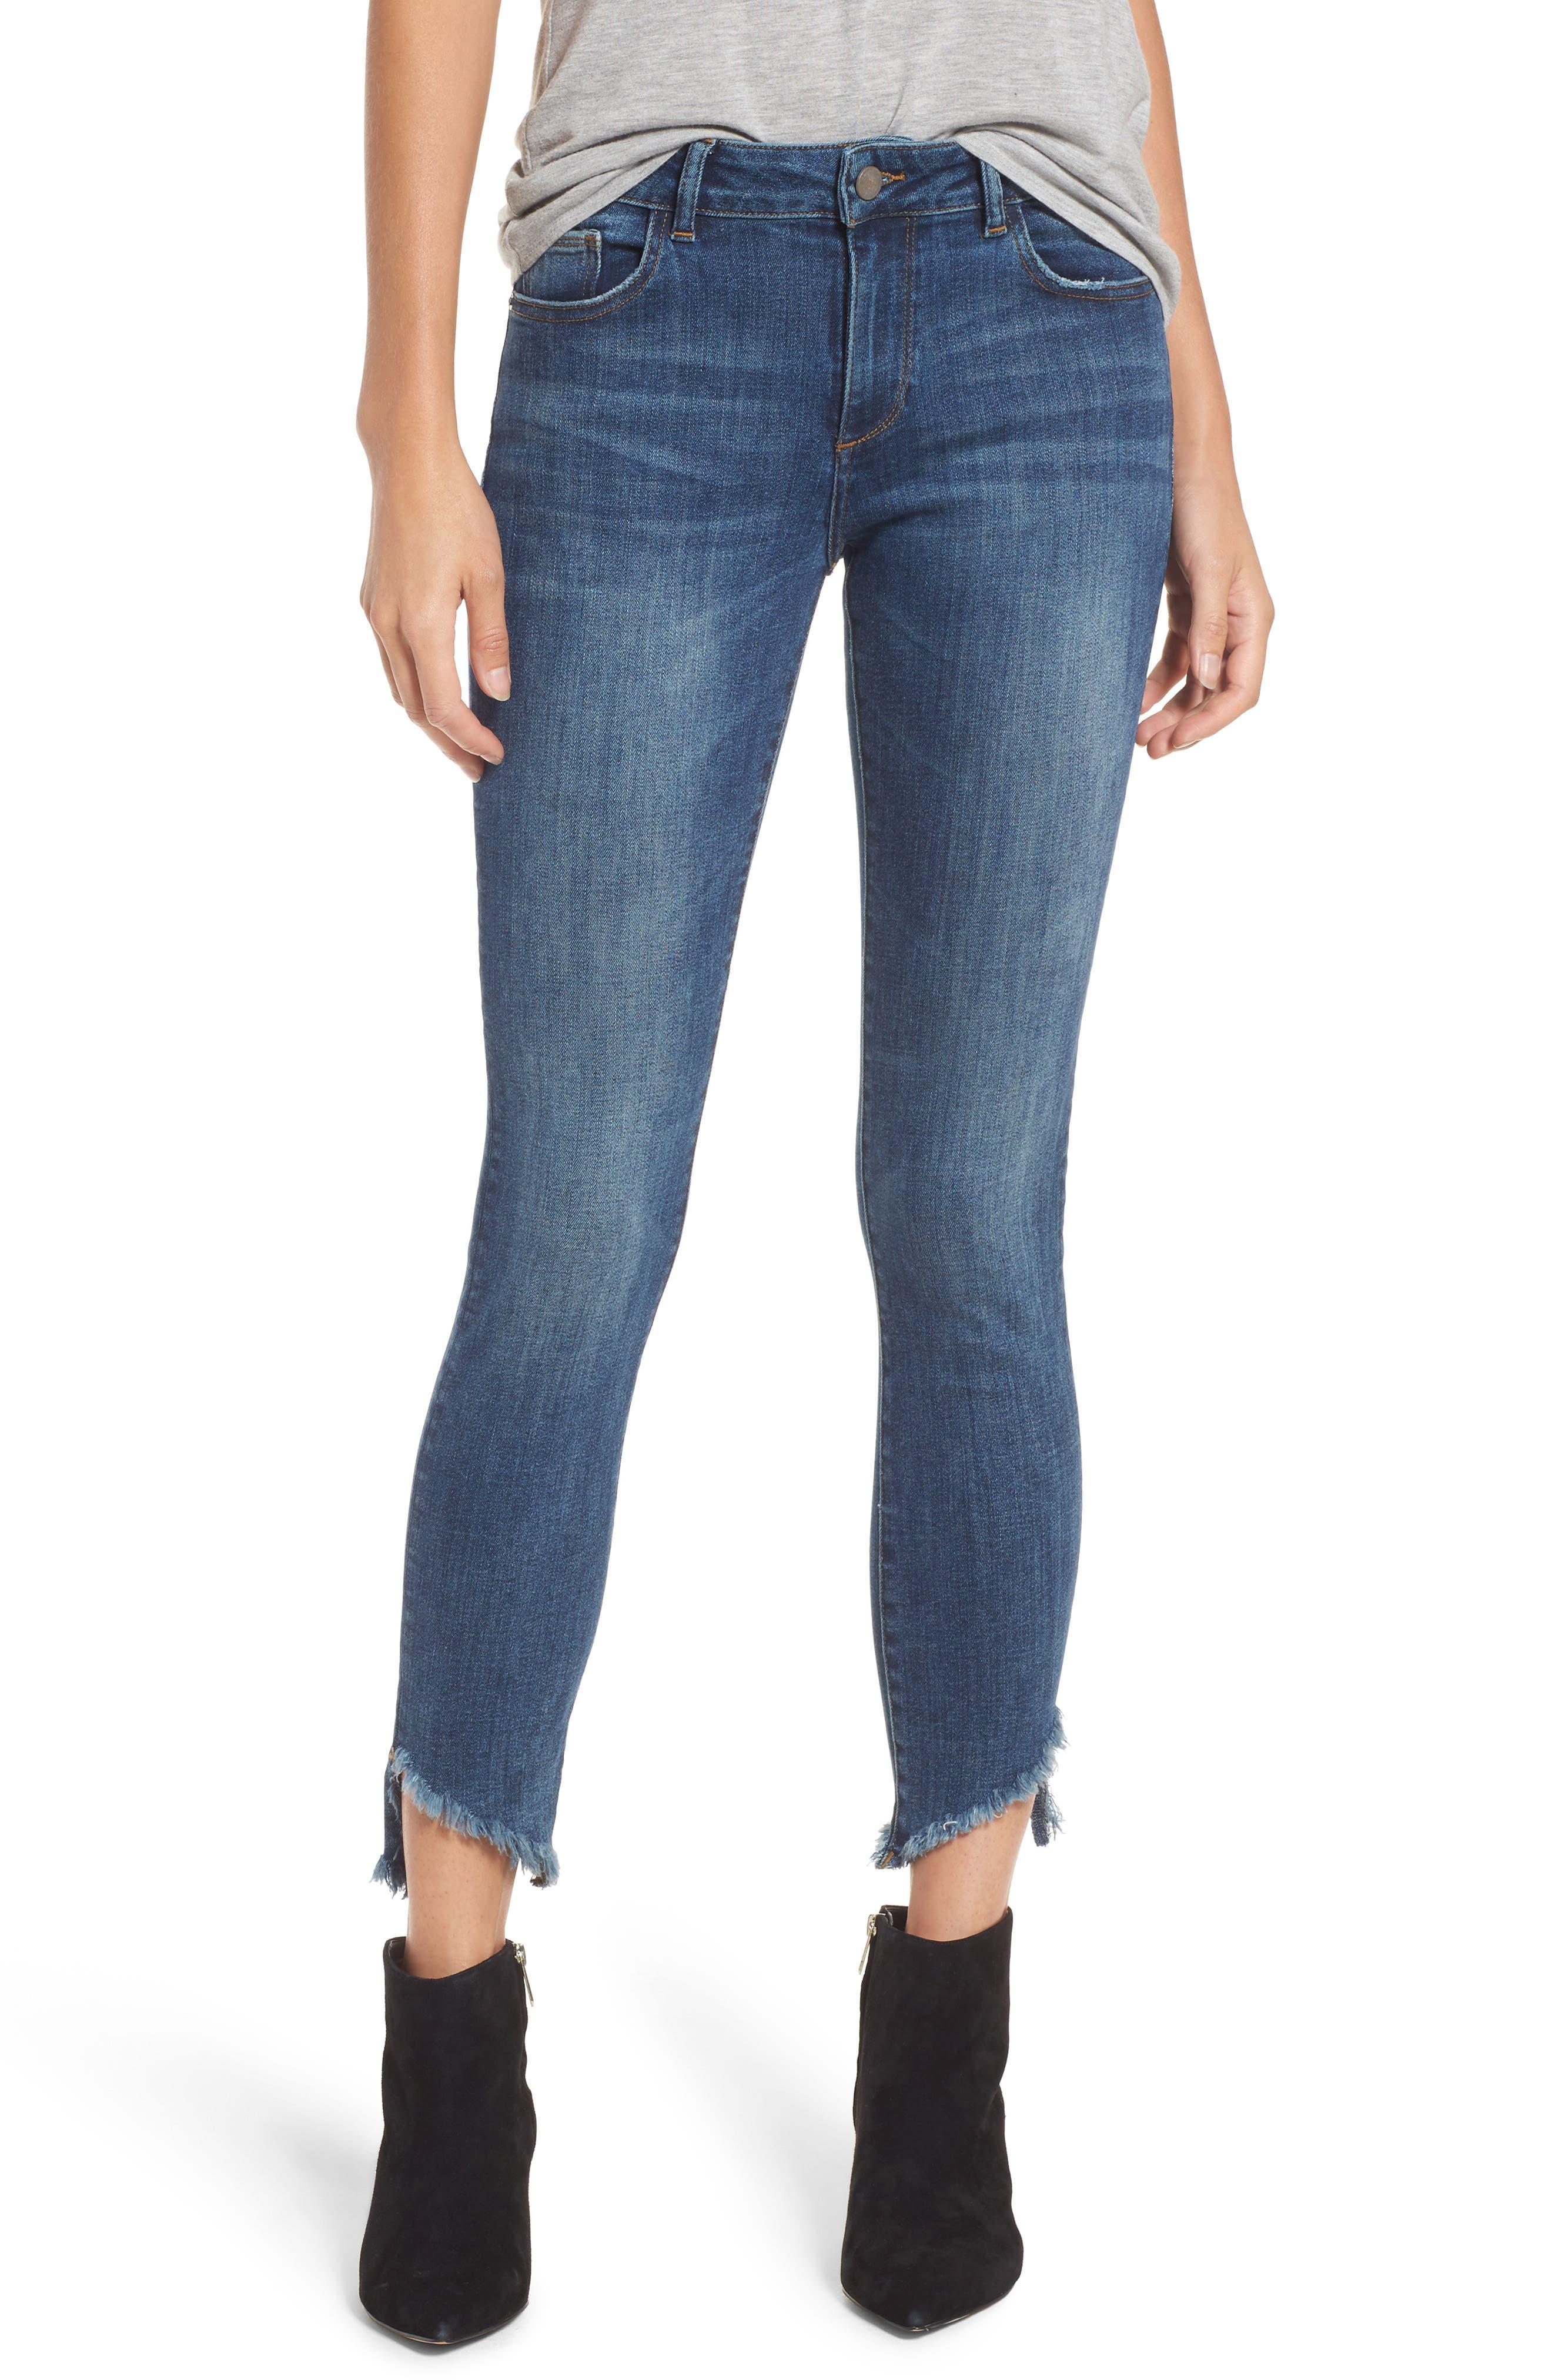 Main Image - DL1961 Margaux Instasculpt Ankle Skinny Jeans (Crawford)